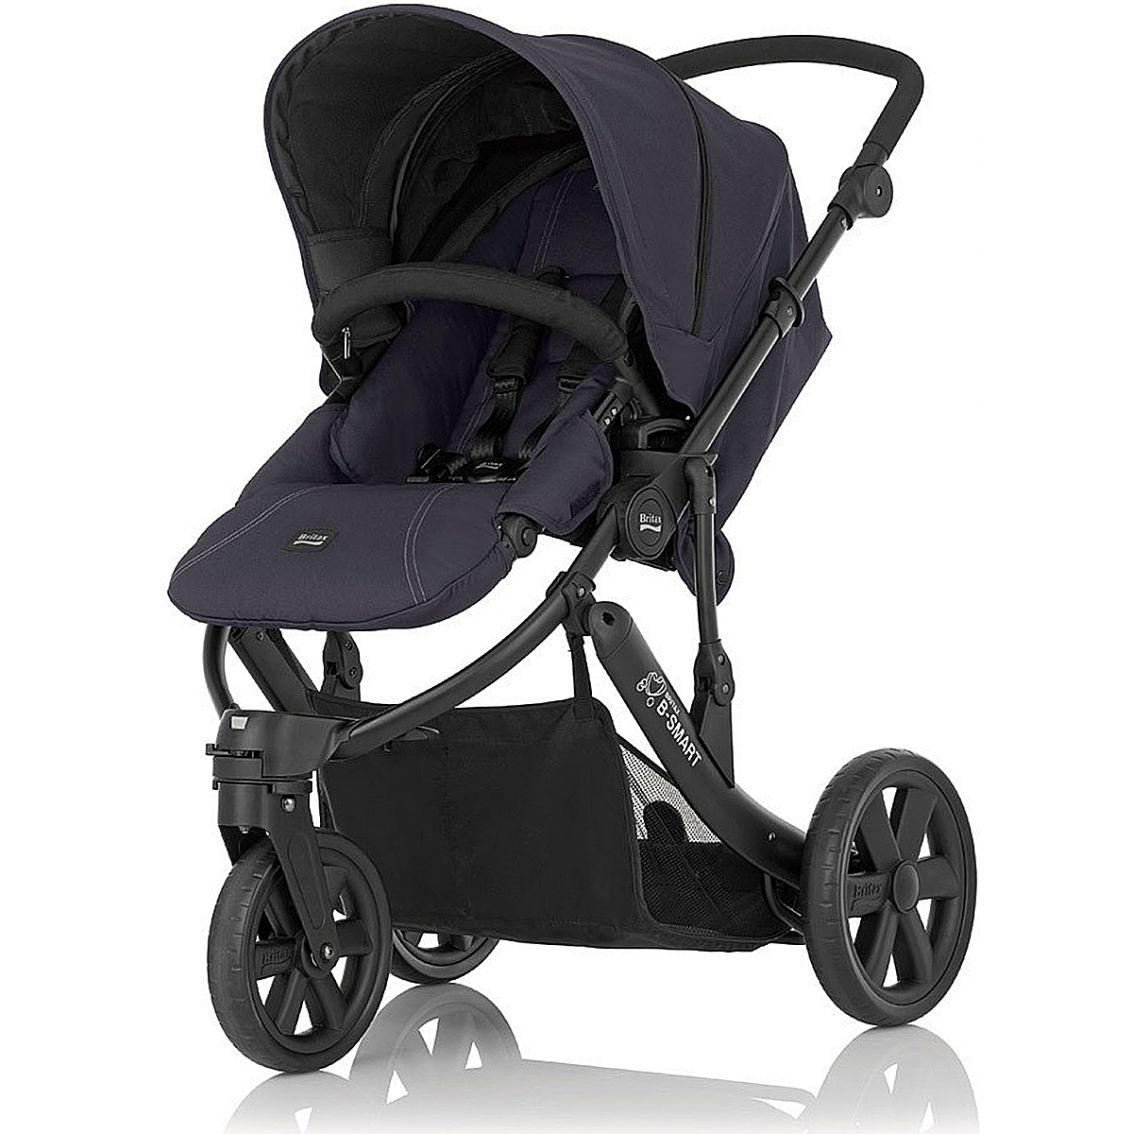 britax b smart 3 wheel stroller pram pushchair buggy. Black Bedroom Furniture Sets. Home Design Ideas